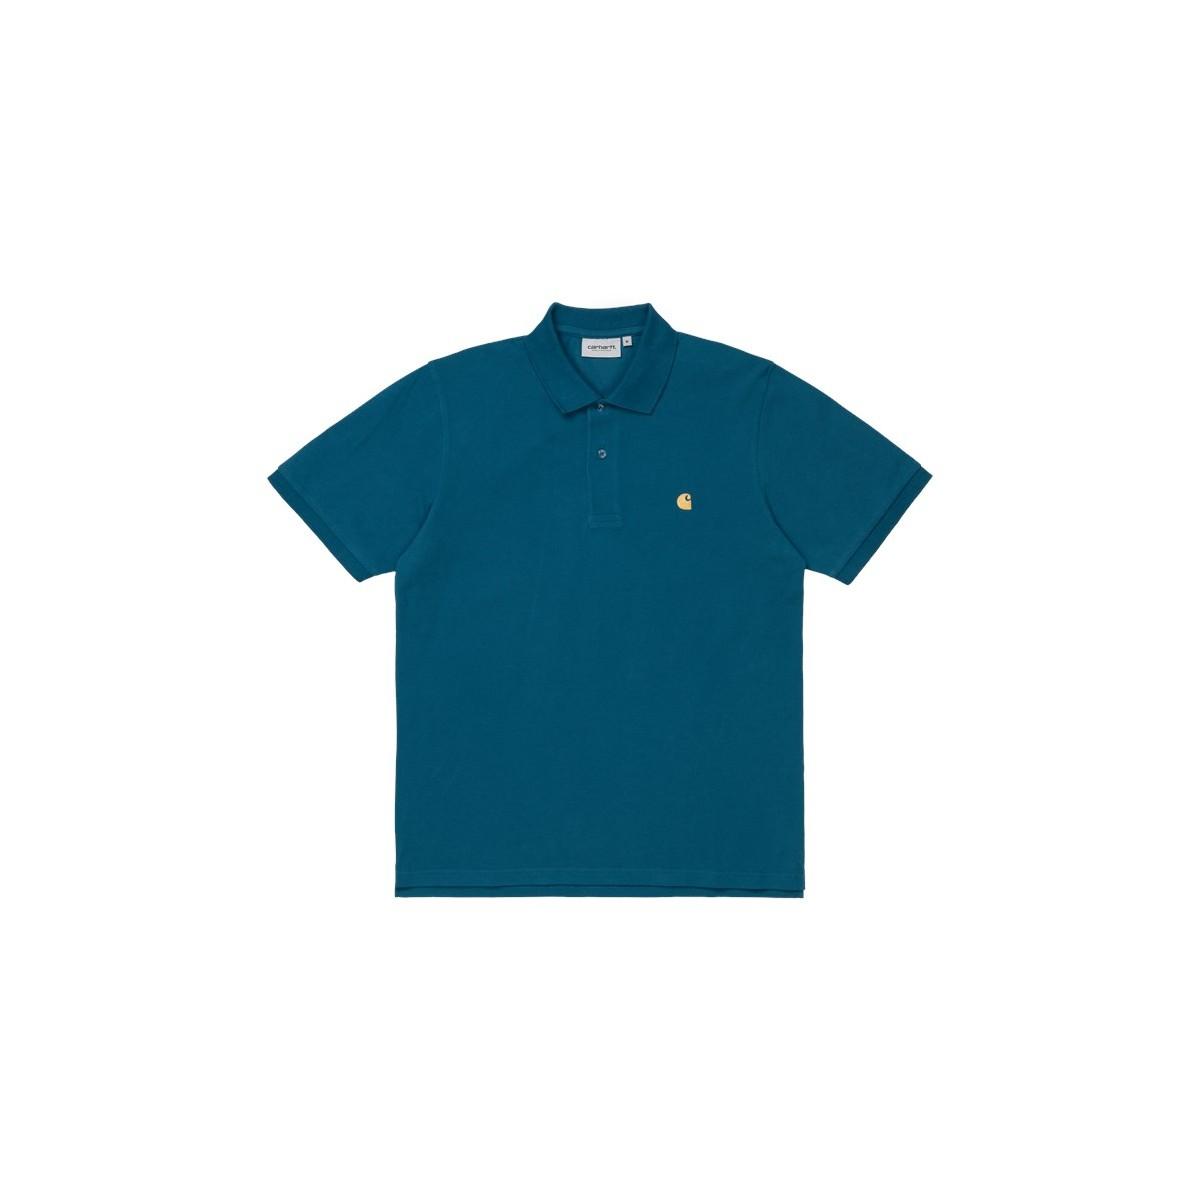 Carhartt WIP - Polo bleu pour homme